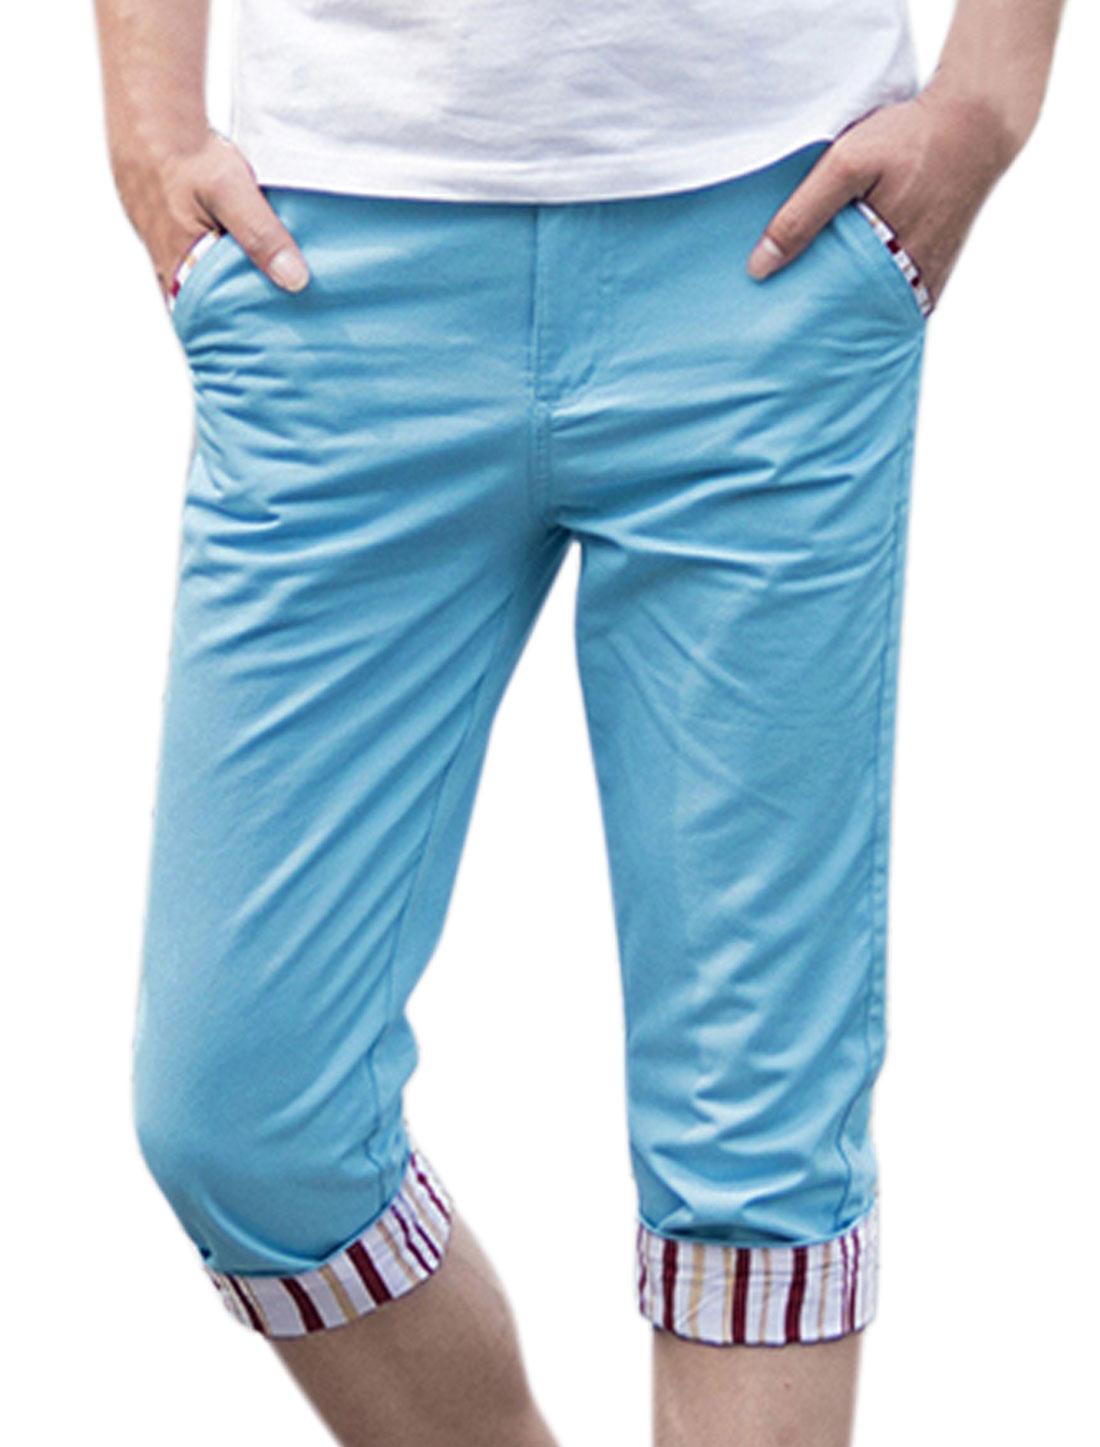 Men Zip Fly Rolled Cuffs Stripes Slim Fit Capris Pants Sky Blue W30